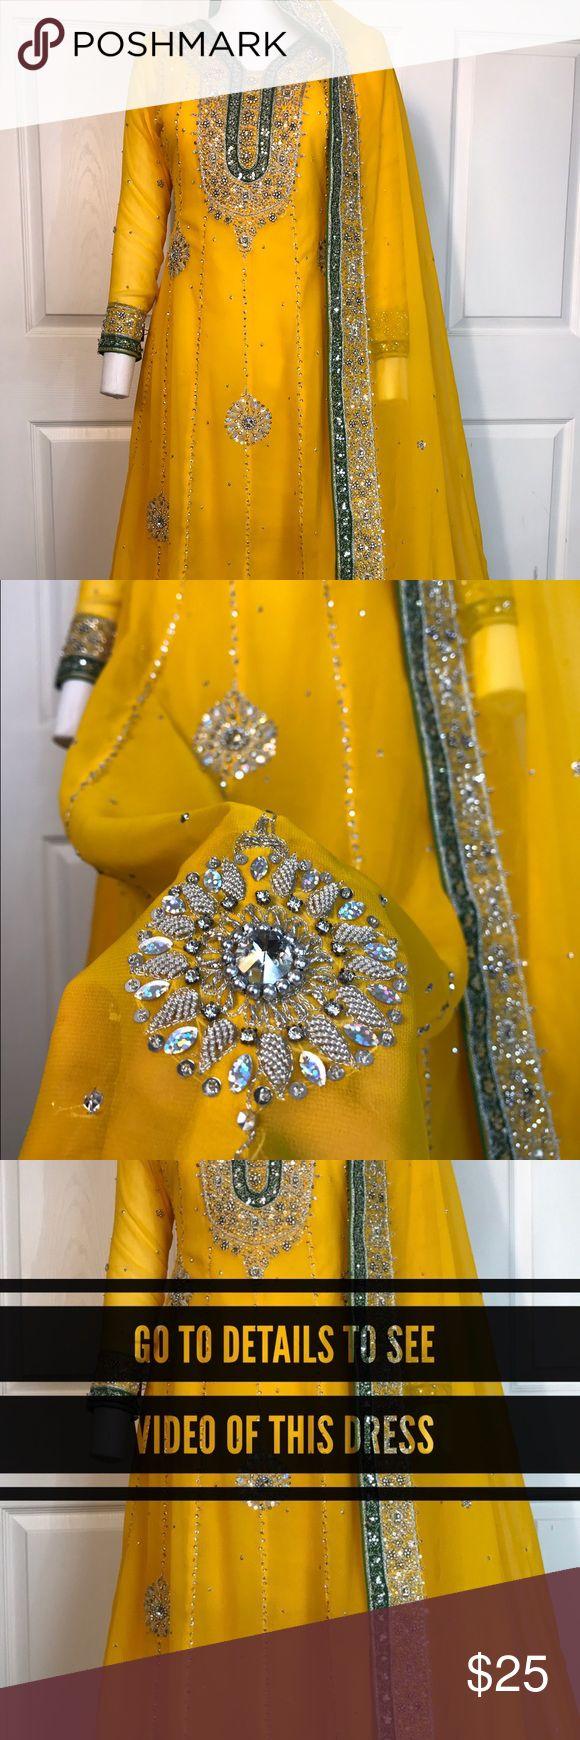 Indian Pakistani Anarkali  Desi lehenga sari dress Selling on eb@y: www.ebay.com/usr/sabaanzaranzar0            (Easy way to remember: Saba-anza-ran-zar-0) All my listings have videos of the dresses as well :) Dresses Maxi